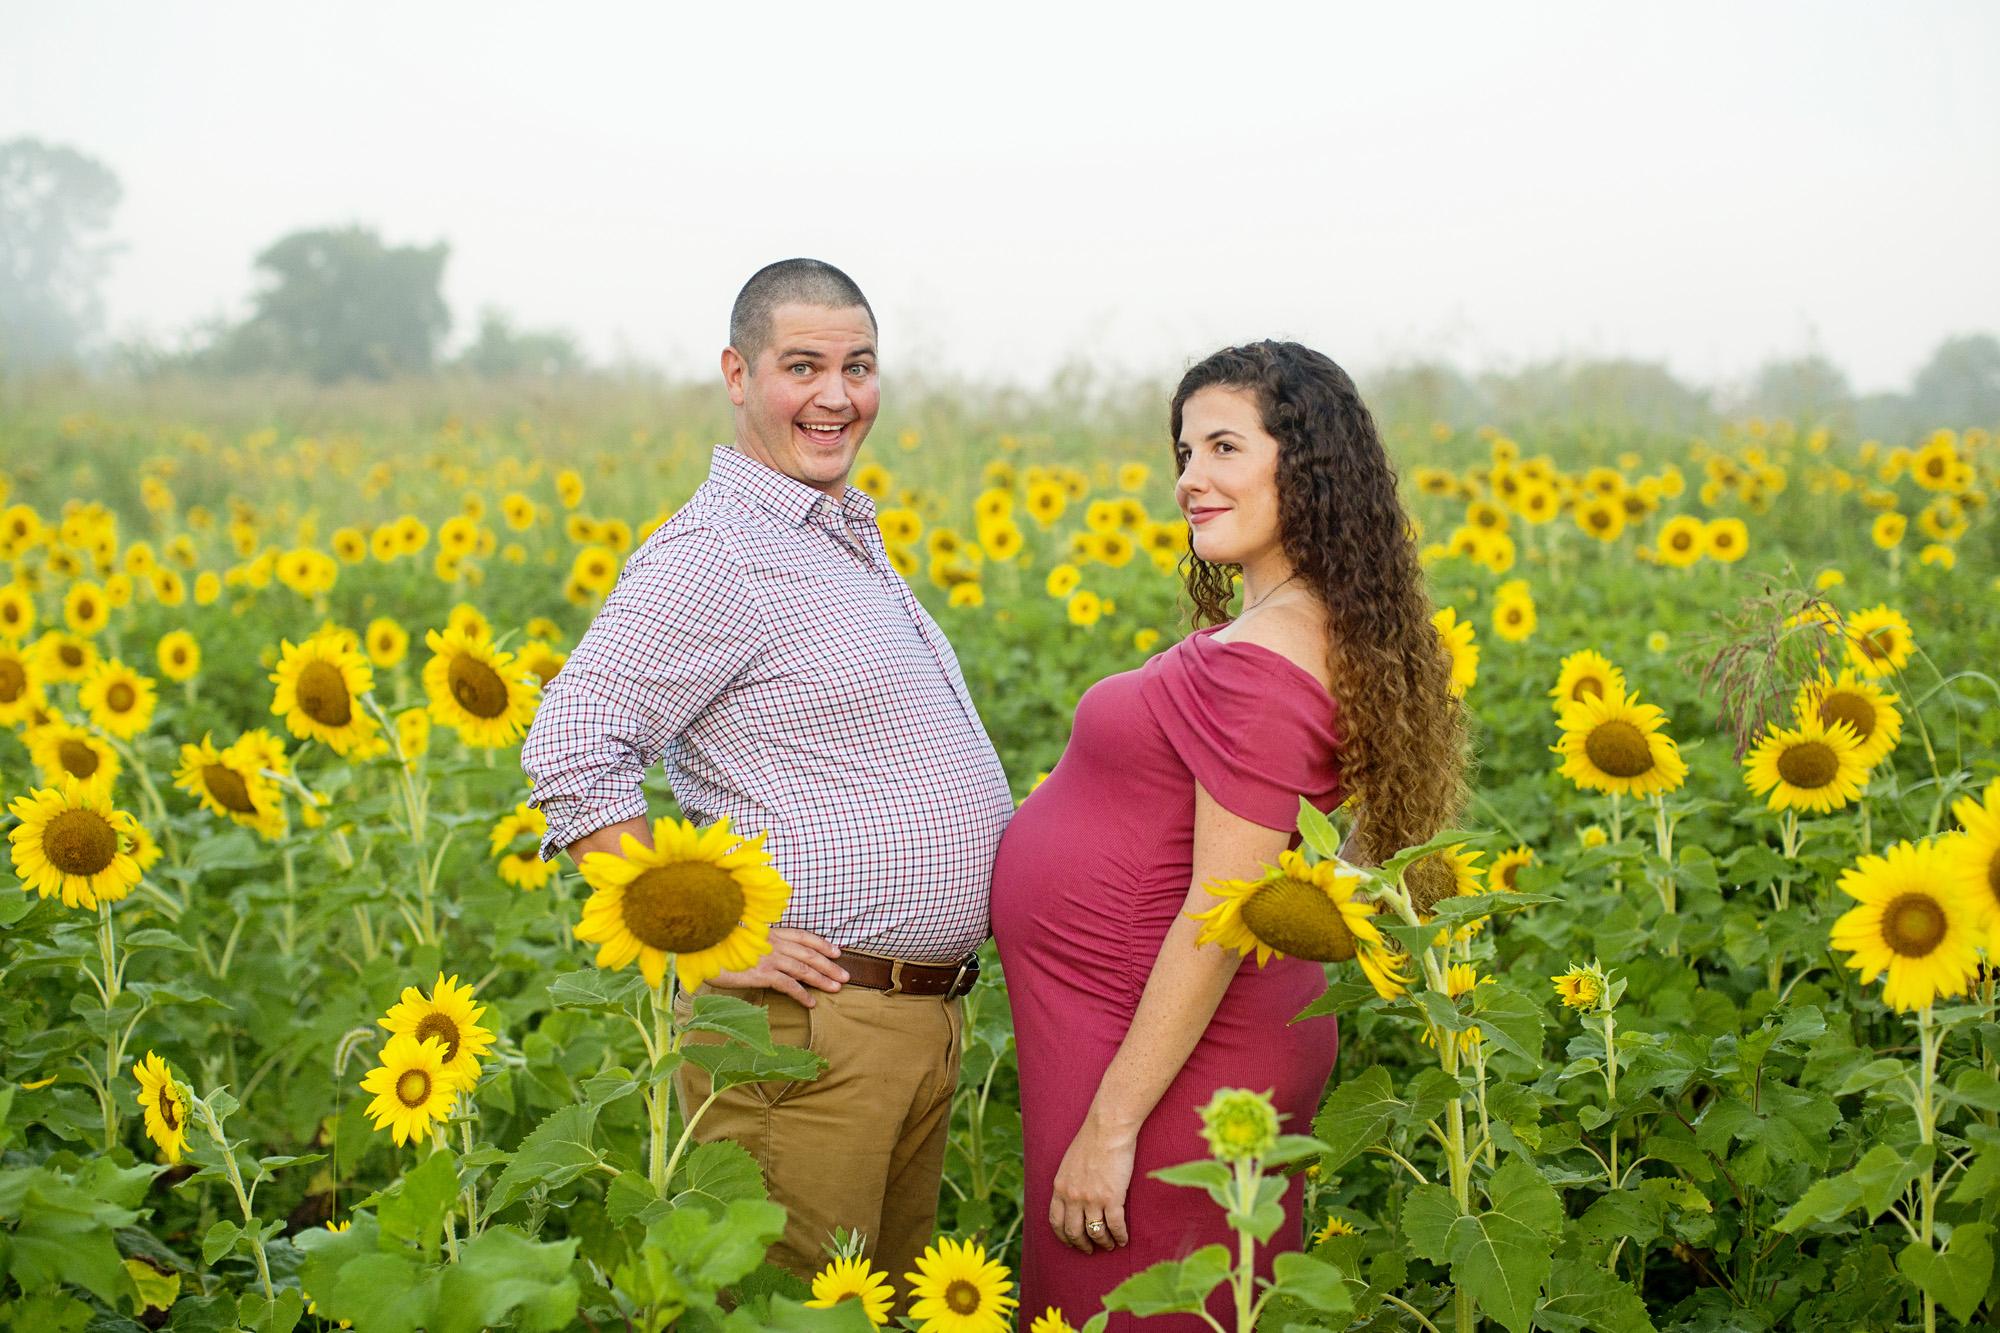 Seriously_Sabrina_Photography_Lexington_Frankfort_Kentucky_Maternity_Mini_Sunflowers_Johns19.jpg